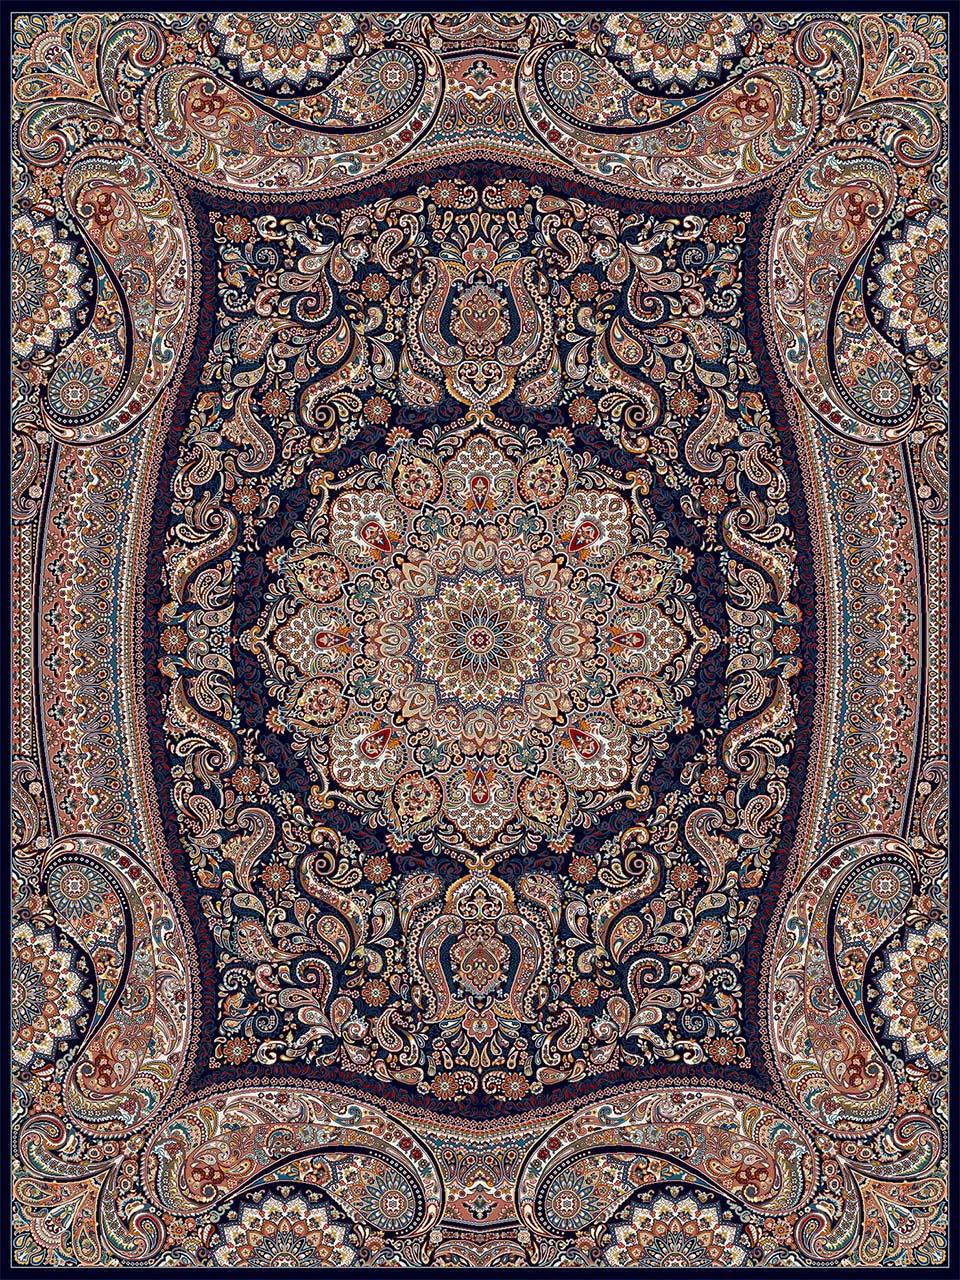 فرش (18122) اکریلیک - 8 رنگ - 500 شانه - سورمه اي - تراکم 1000